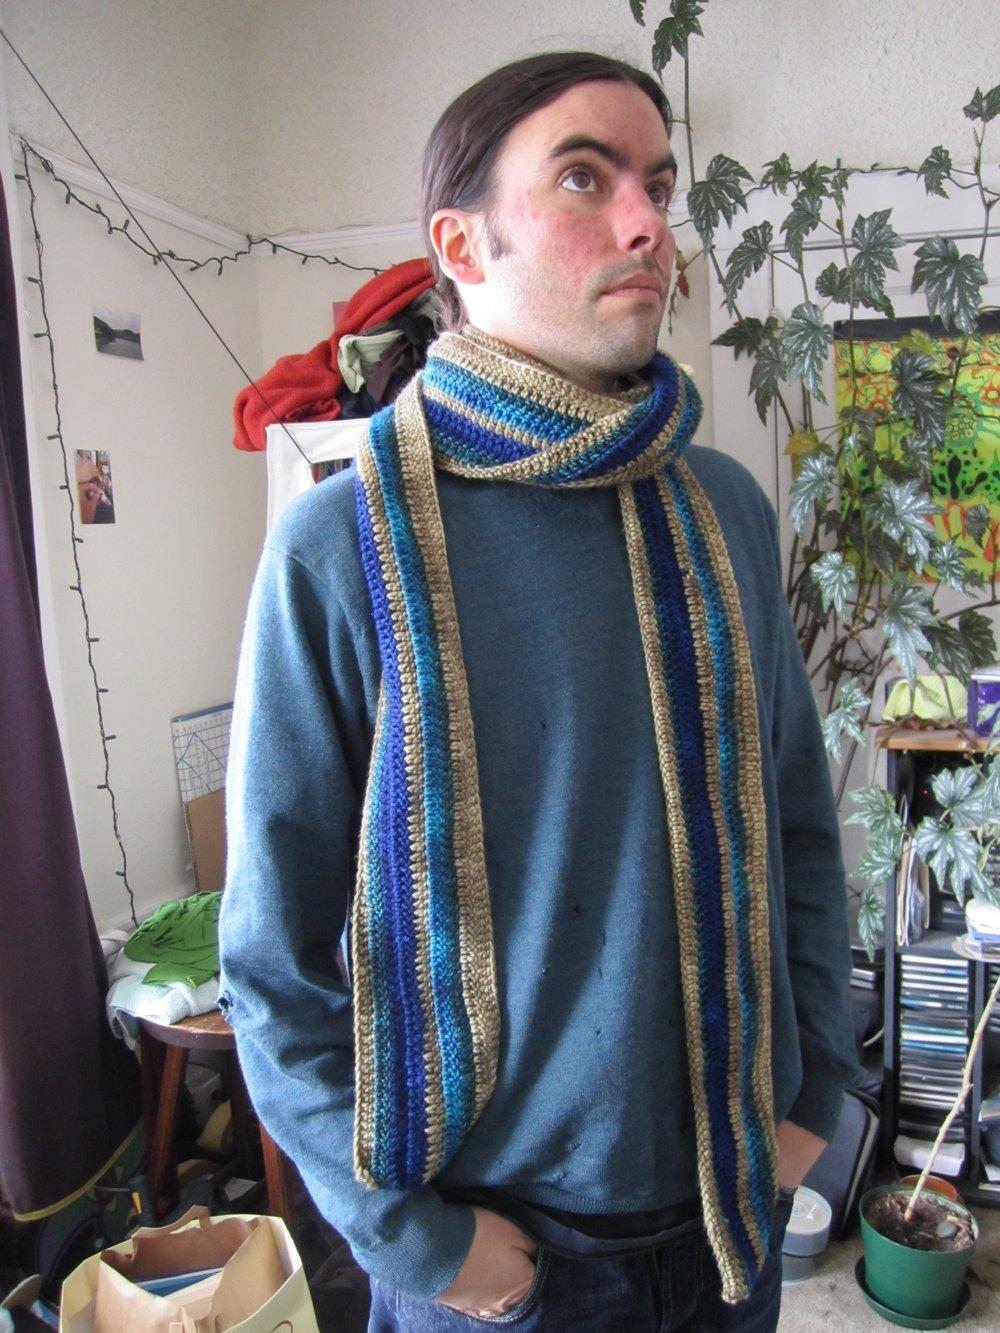 Model: Matt Welsh